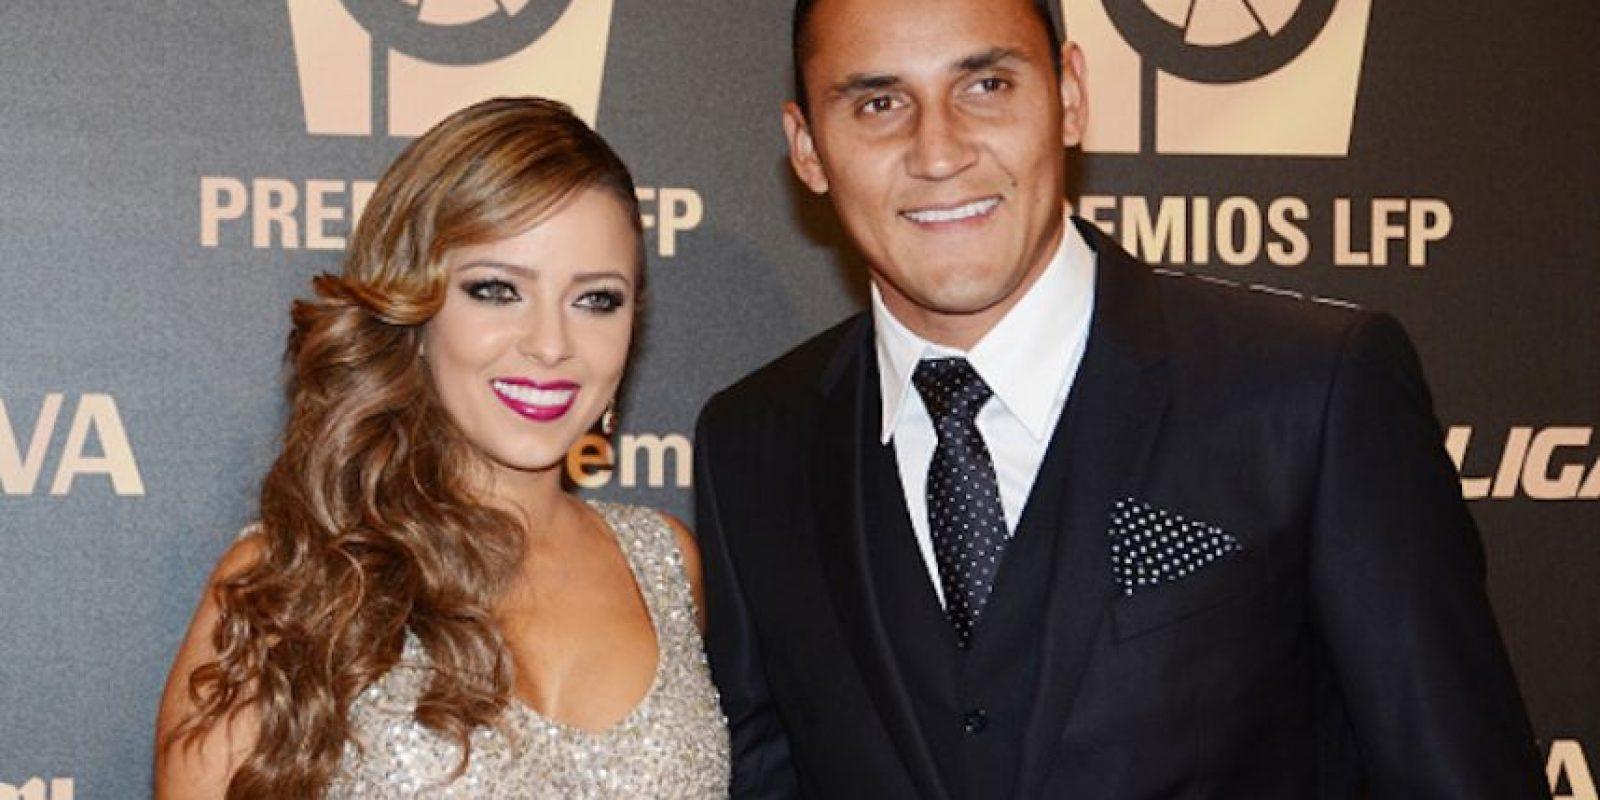 Andrea Salas es la pareja de Keylor Navas, arquero del Real Madrid. Foto:Getty Images